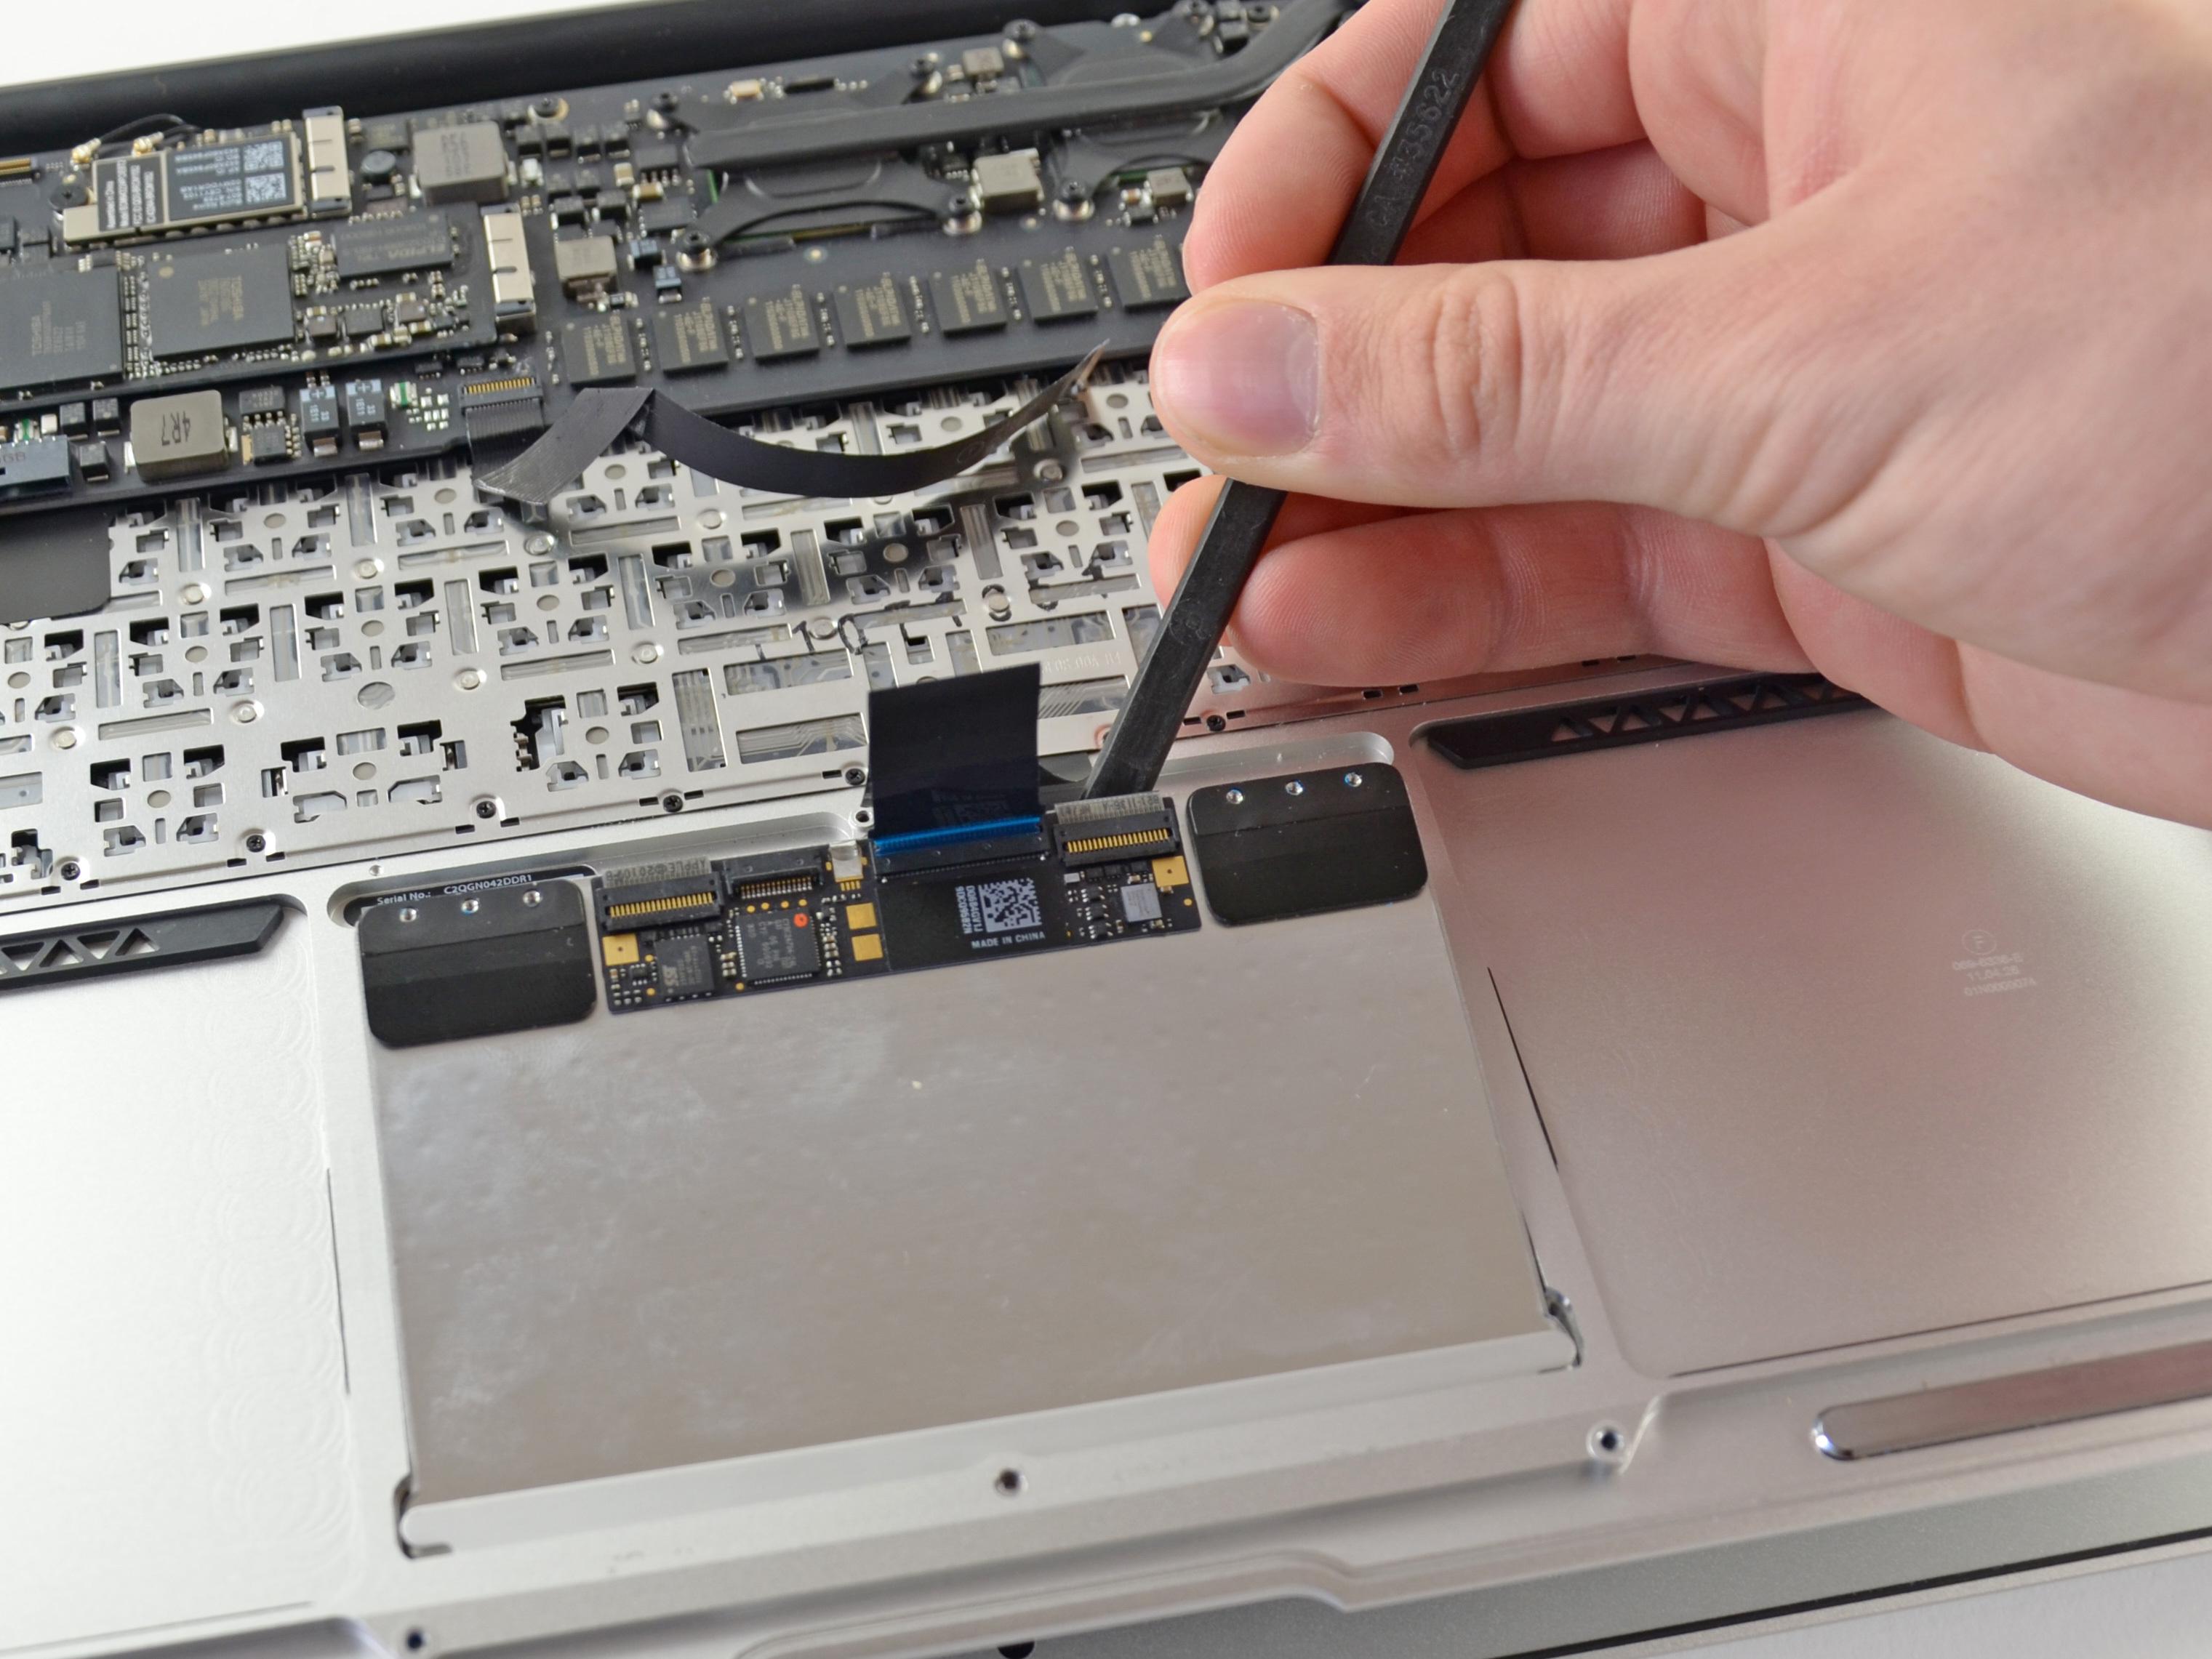 Apple MacBook Pro user manual PDF